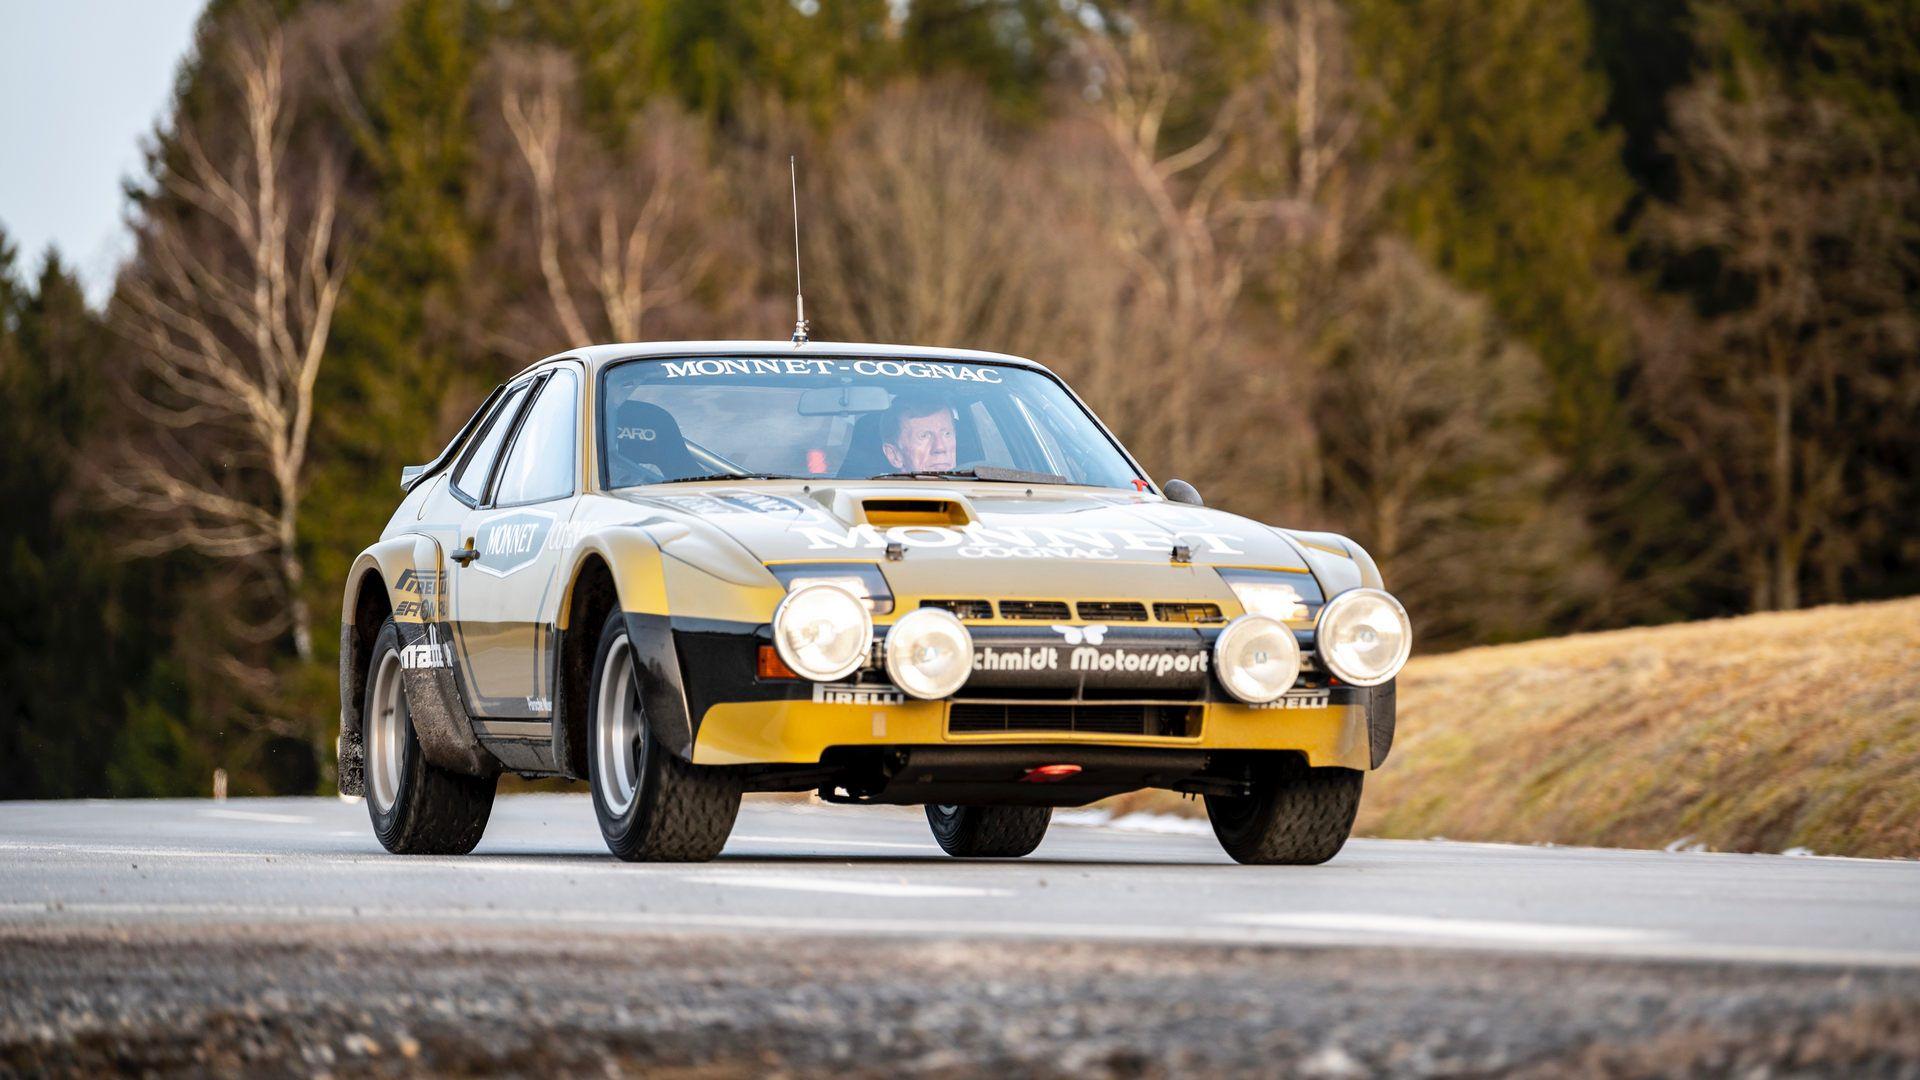 Porsche-924-Carrera-GTS-rally-car-Walter-Rohrl-9